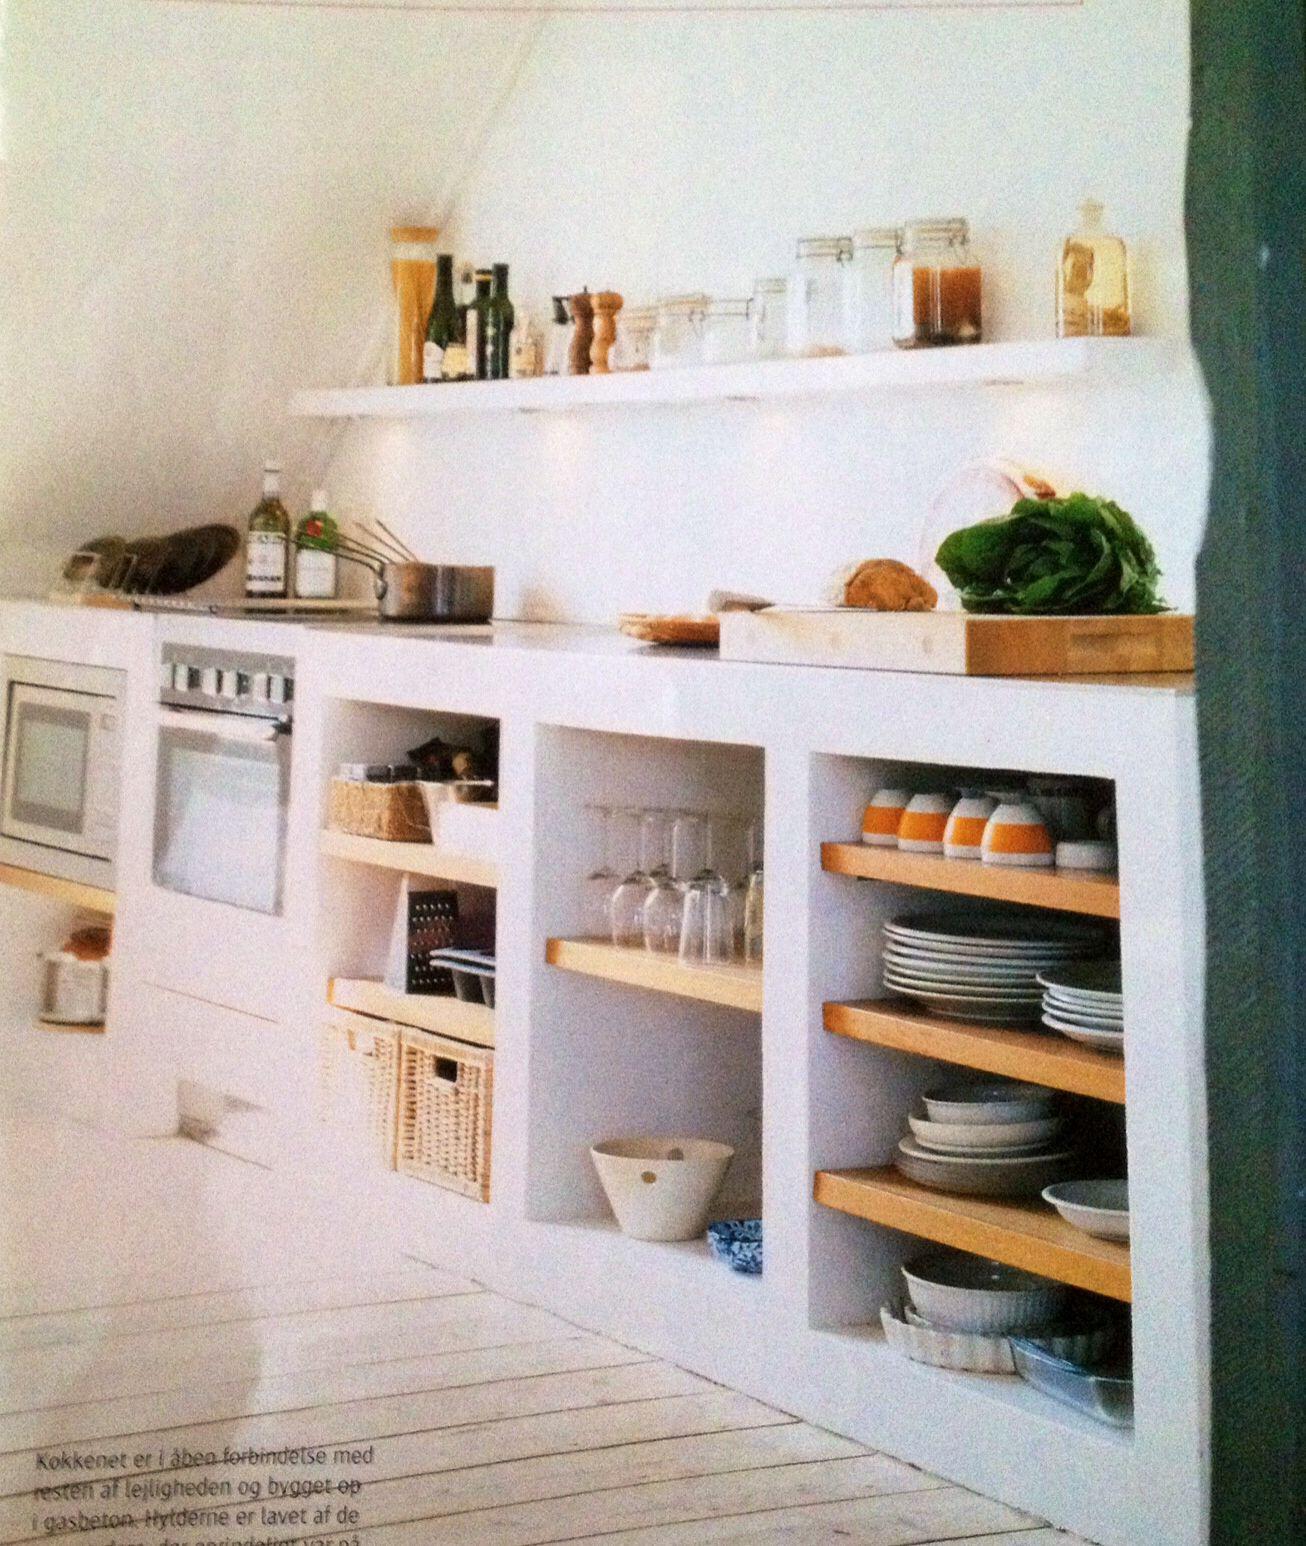 k kken i gasbeton bent system keuken k che k chenm bel en k chen ideen. Black Bedroom Furniture Sets. Home Design Ideas